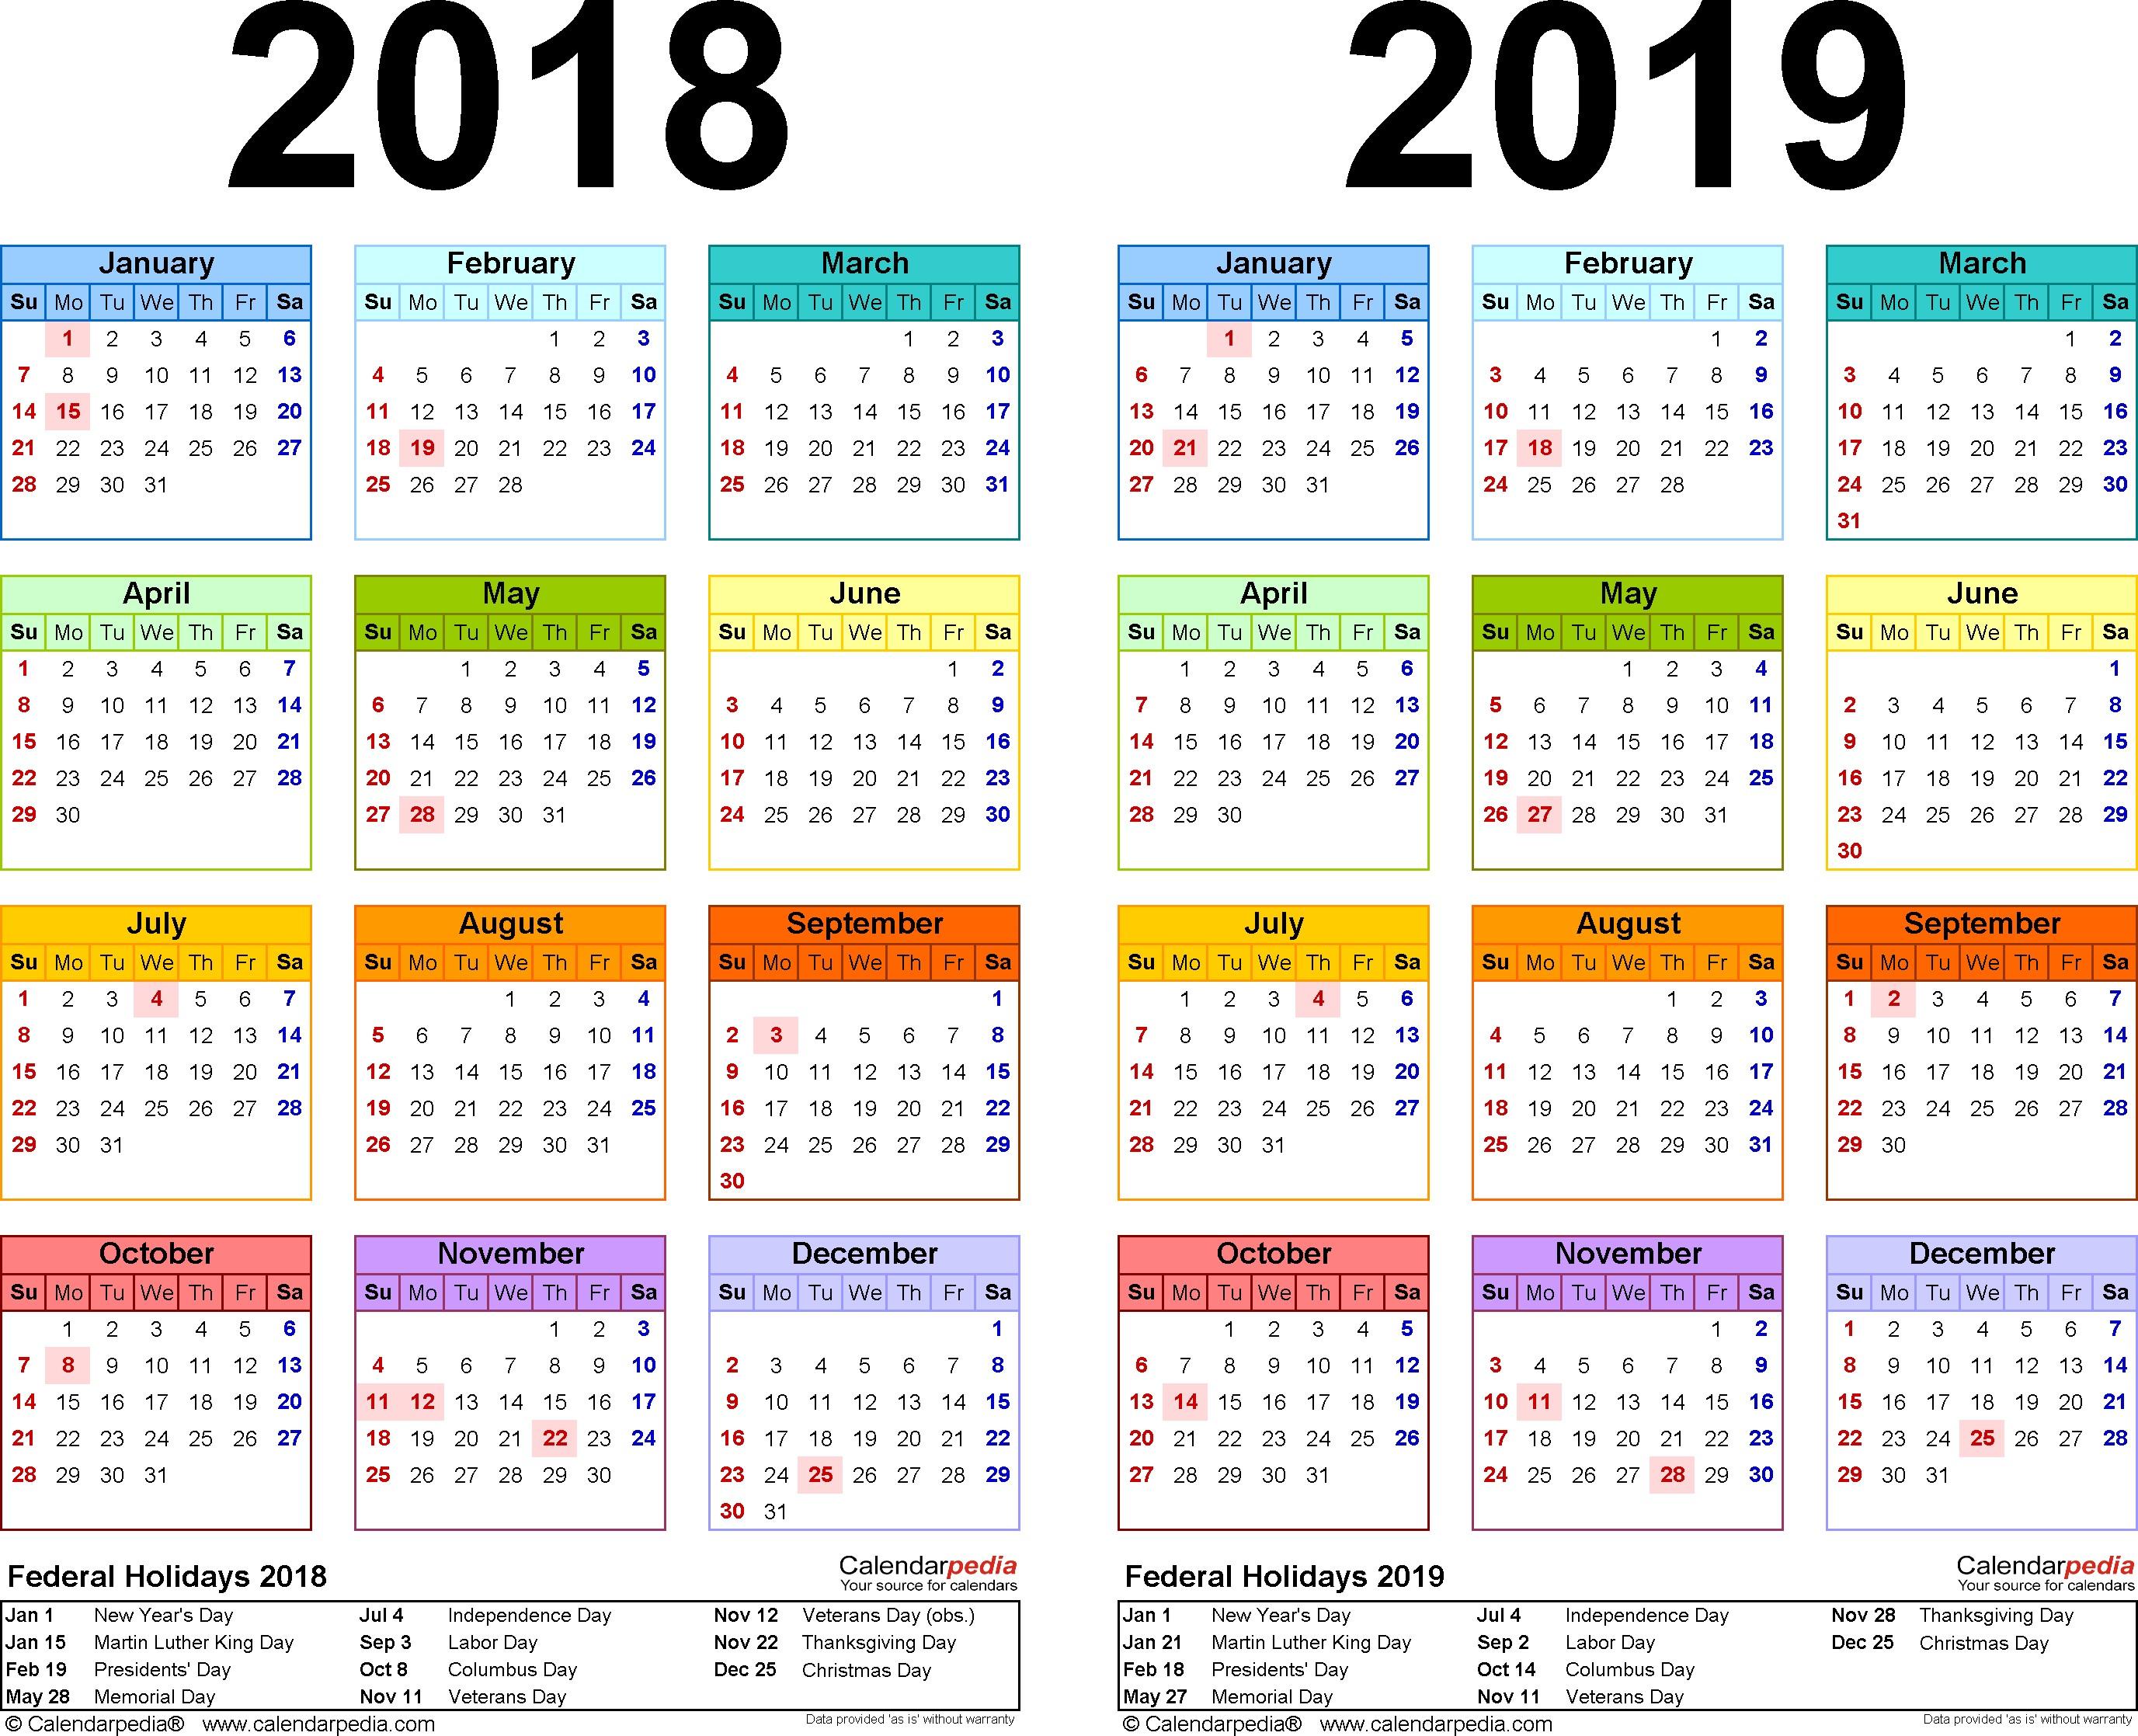 Free Printable Calendar Uk 2019 Calendar Uk